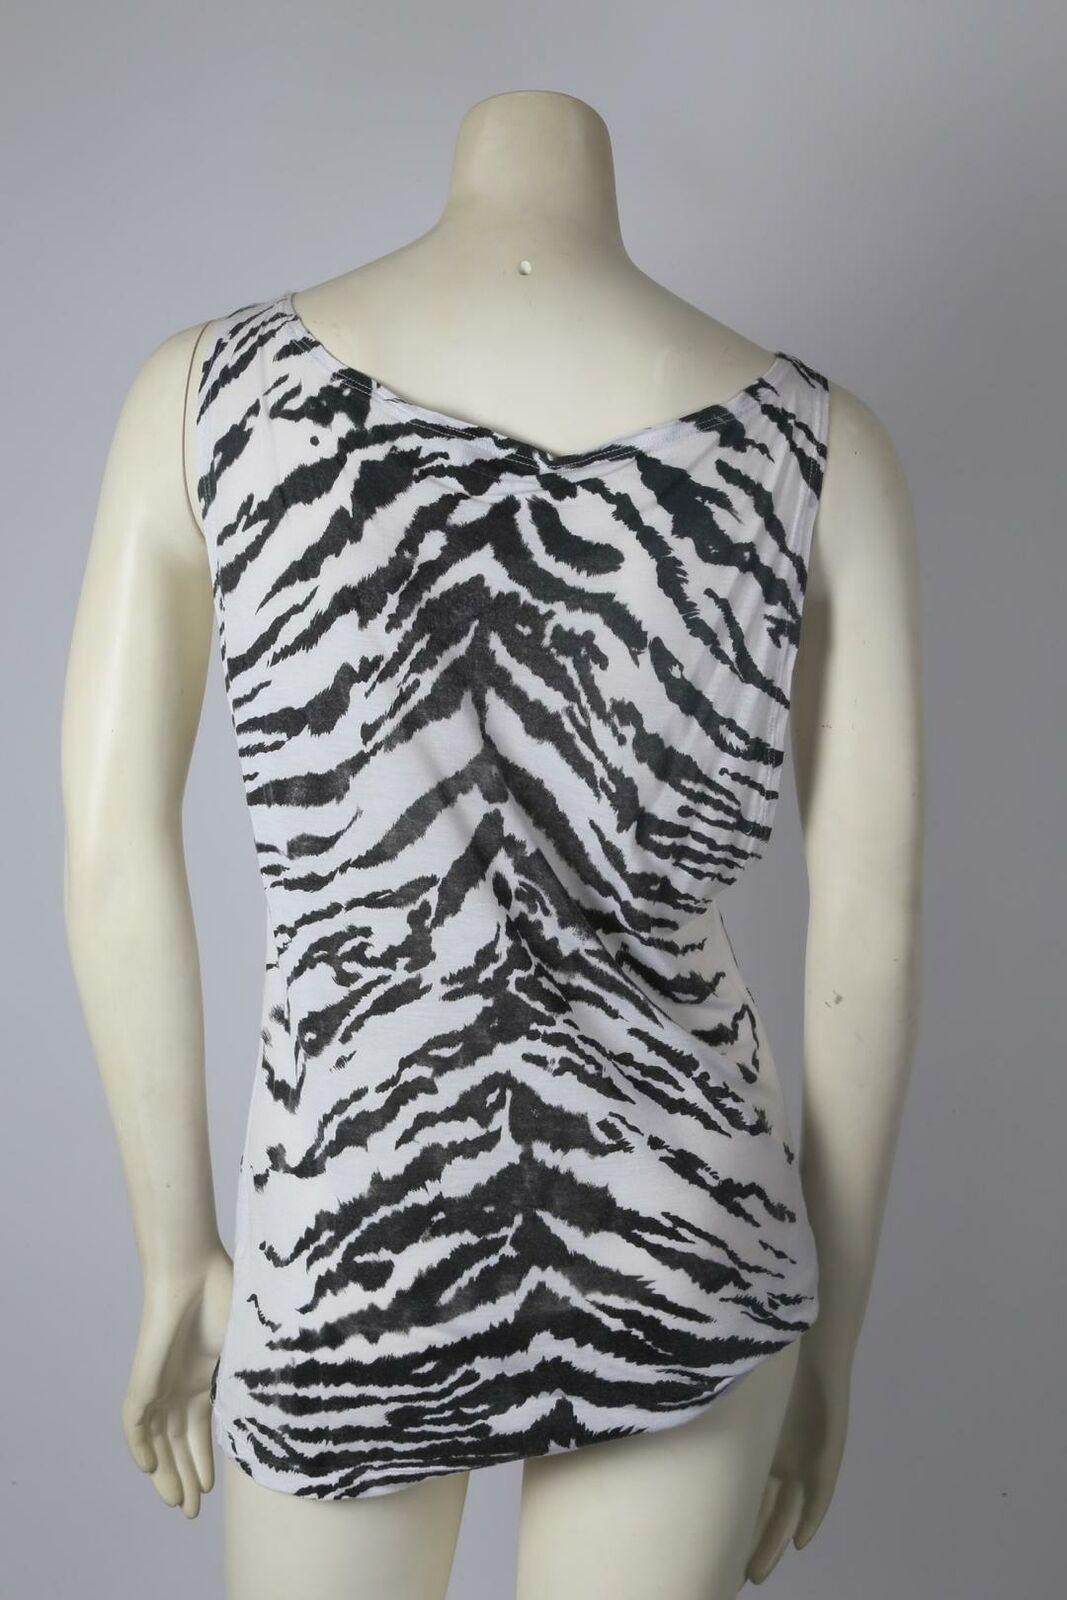 SAINT LAURENT Zebra Print Sleeveless Top Size S - image 5